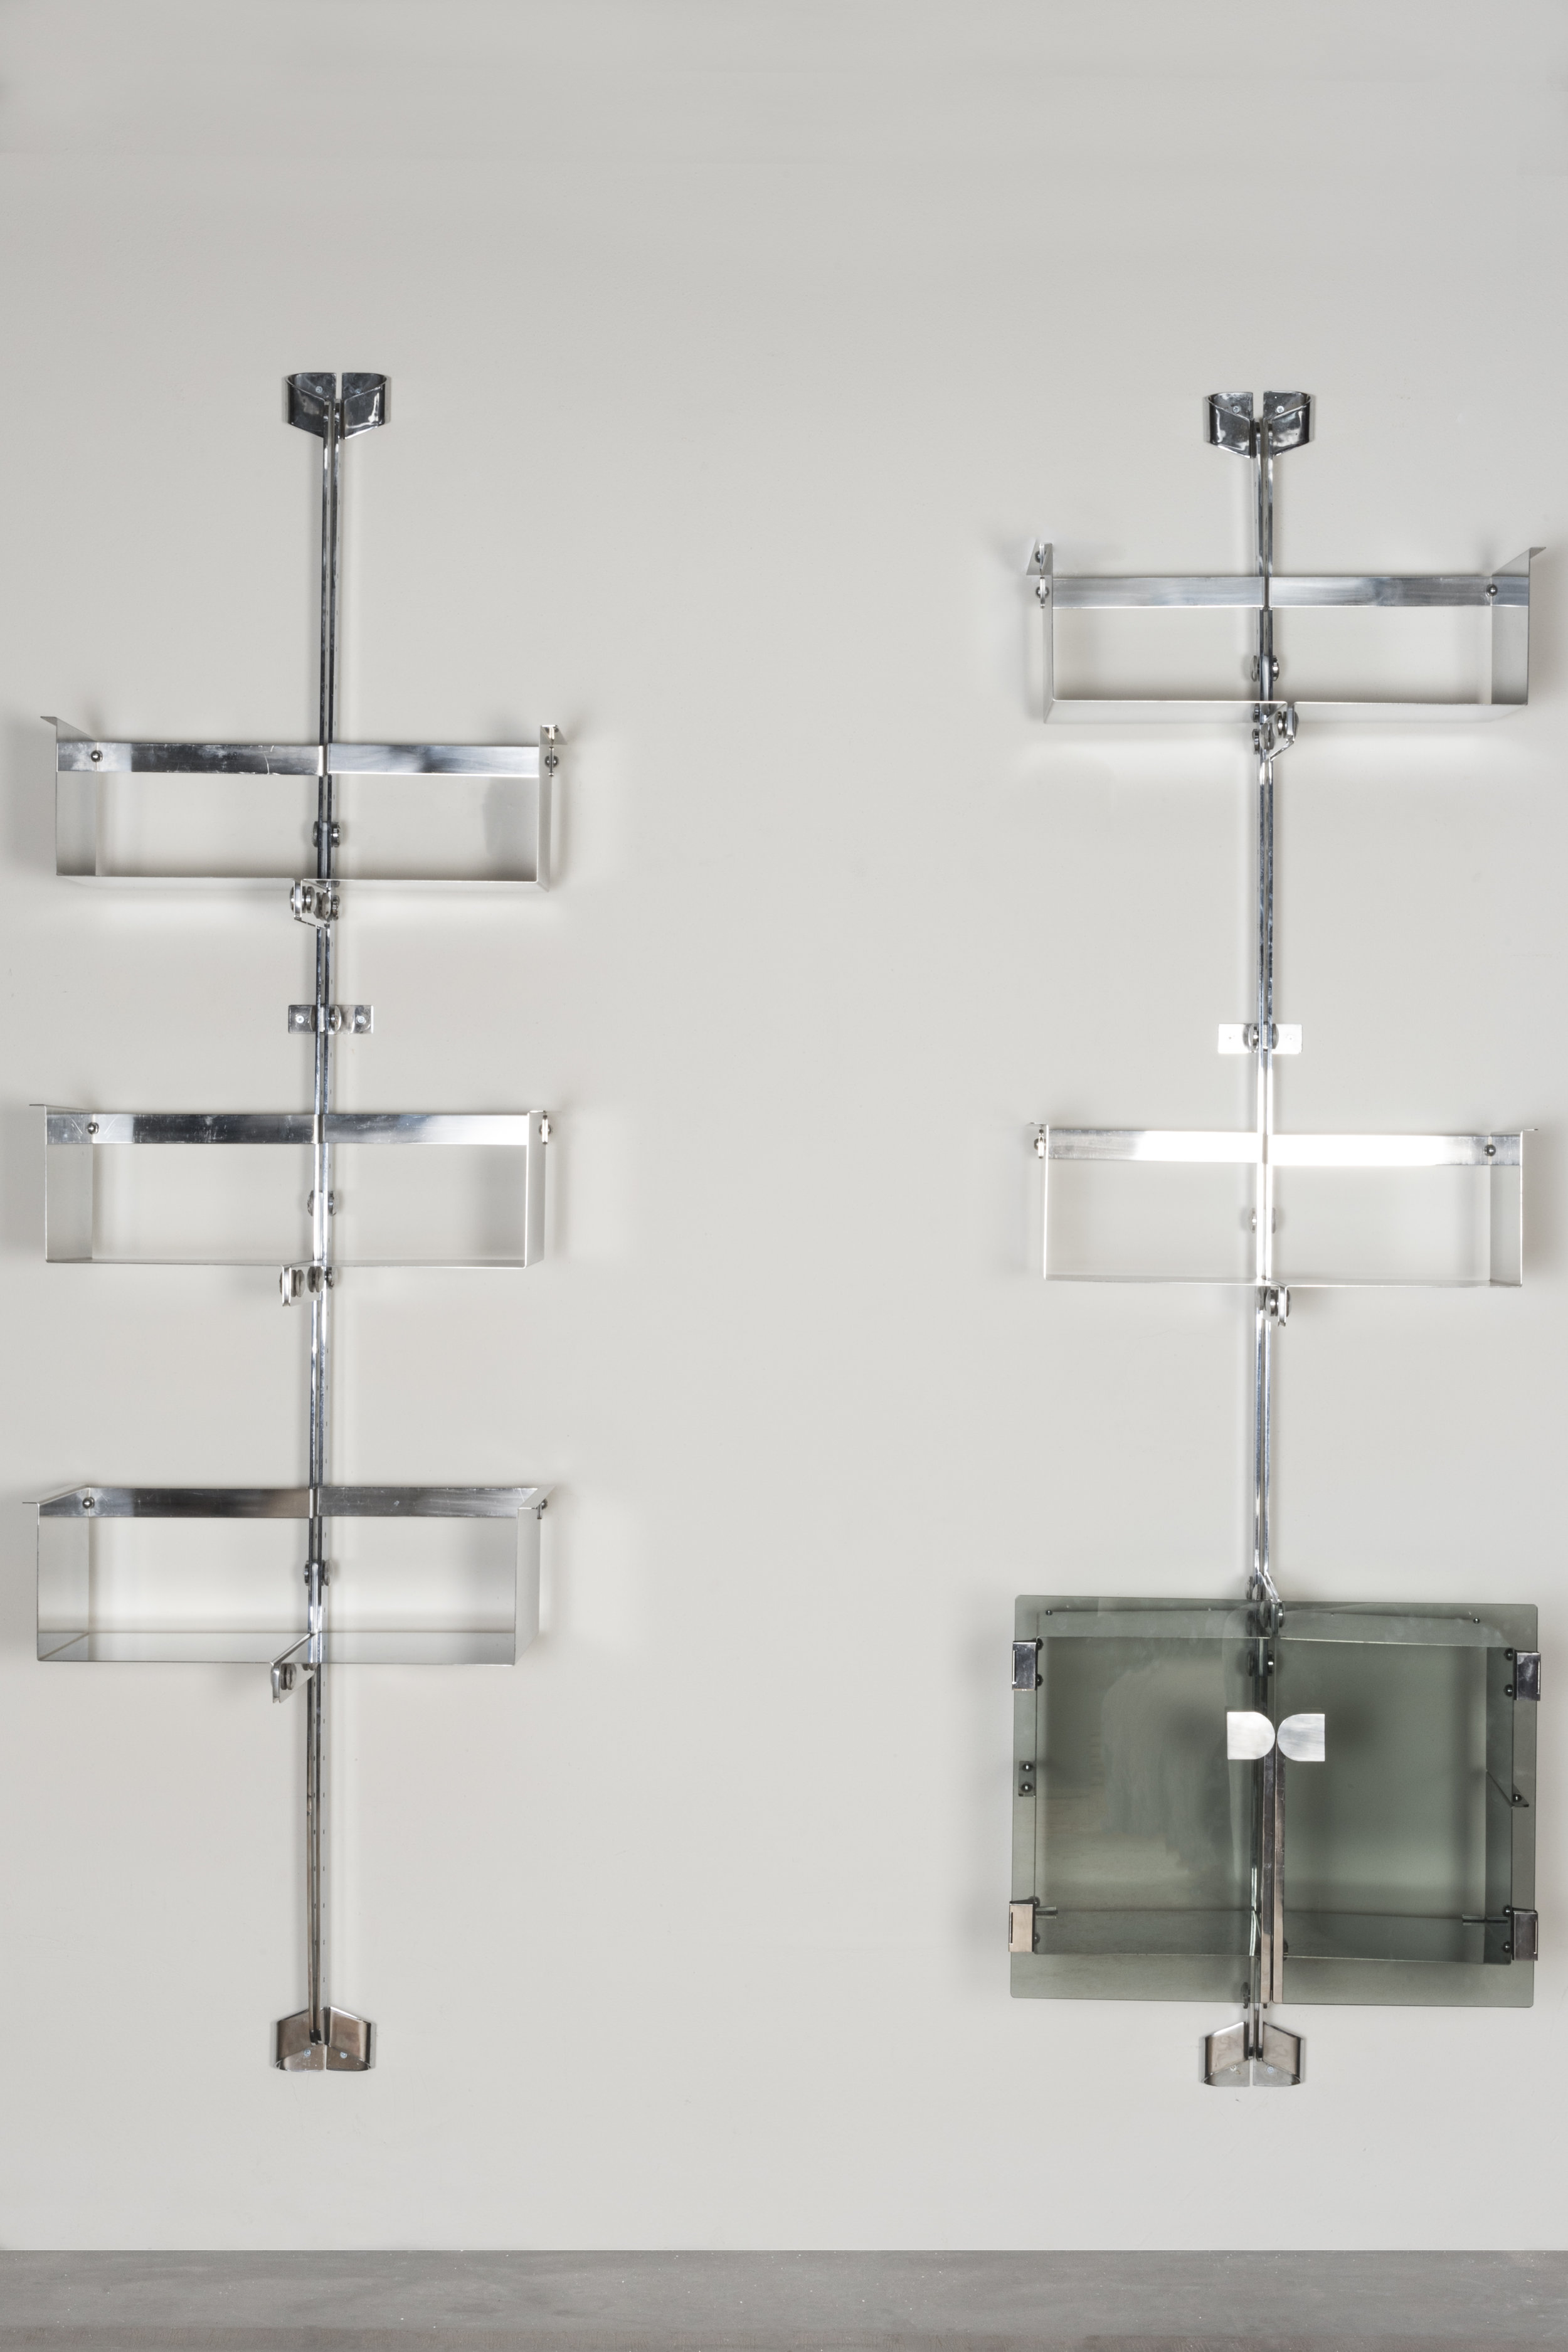 Three  Proposal  bookcases Italy, 1969, on display at Nilufar stand, Design Miami 2018  Design: Vittorio Introini Manufactured by Saporiti  Chromed steel, glass; Single module size: 65x37xh232cm / 25.5x14.5xh 91.3 in